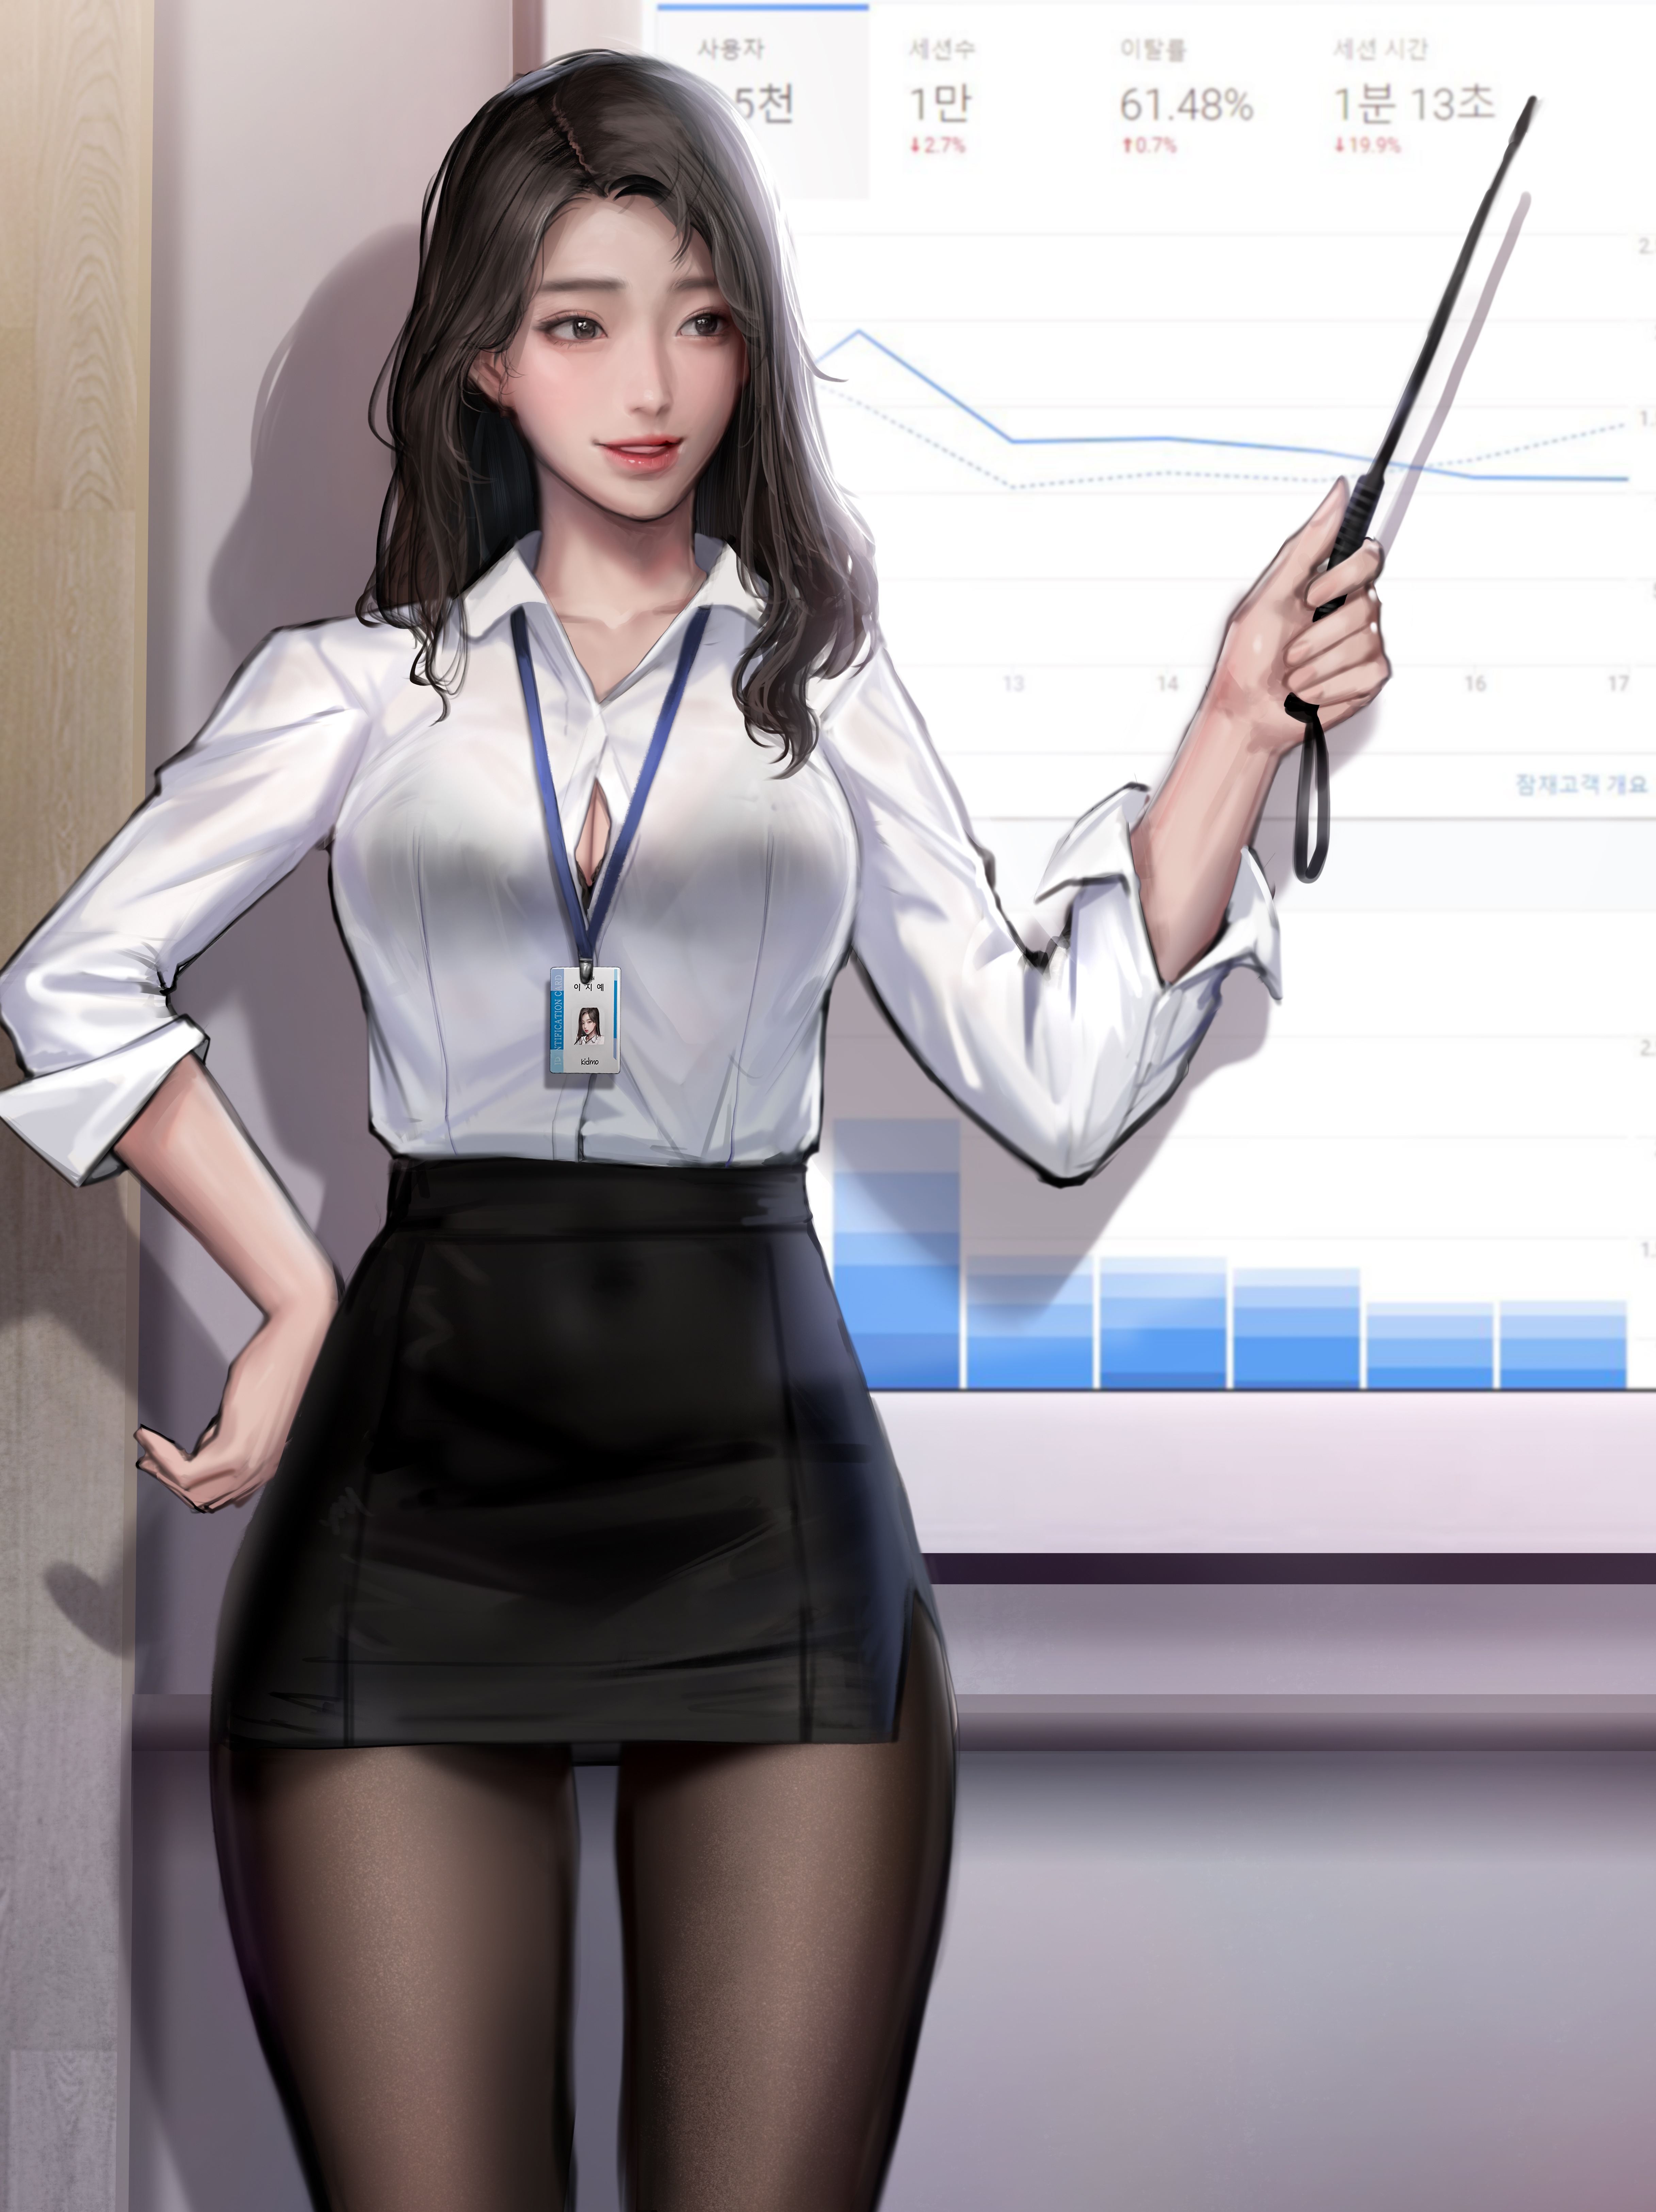 Office Girl Brunette Asian Original Characters Smiling Shirt Tights 2D Artwork Drawing Illustration  4866x6498